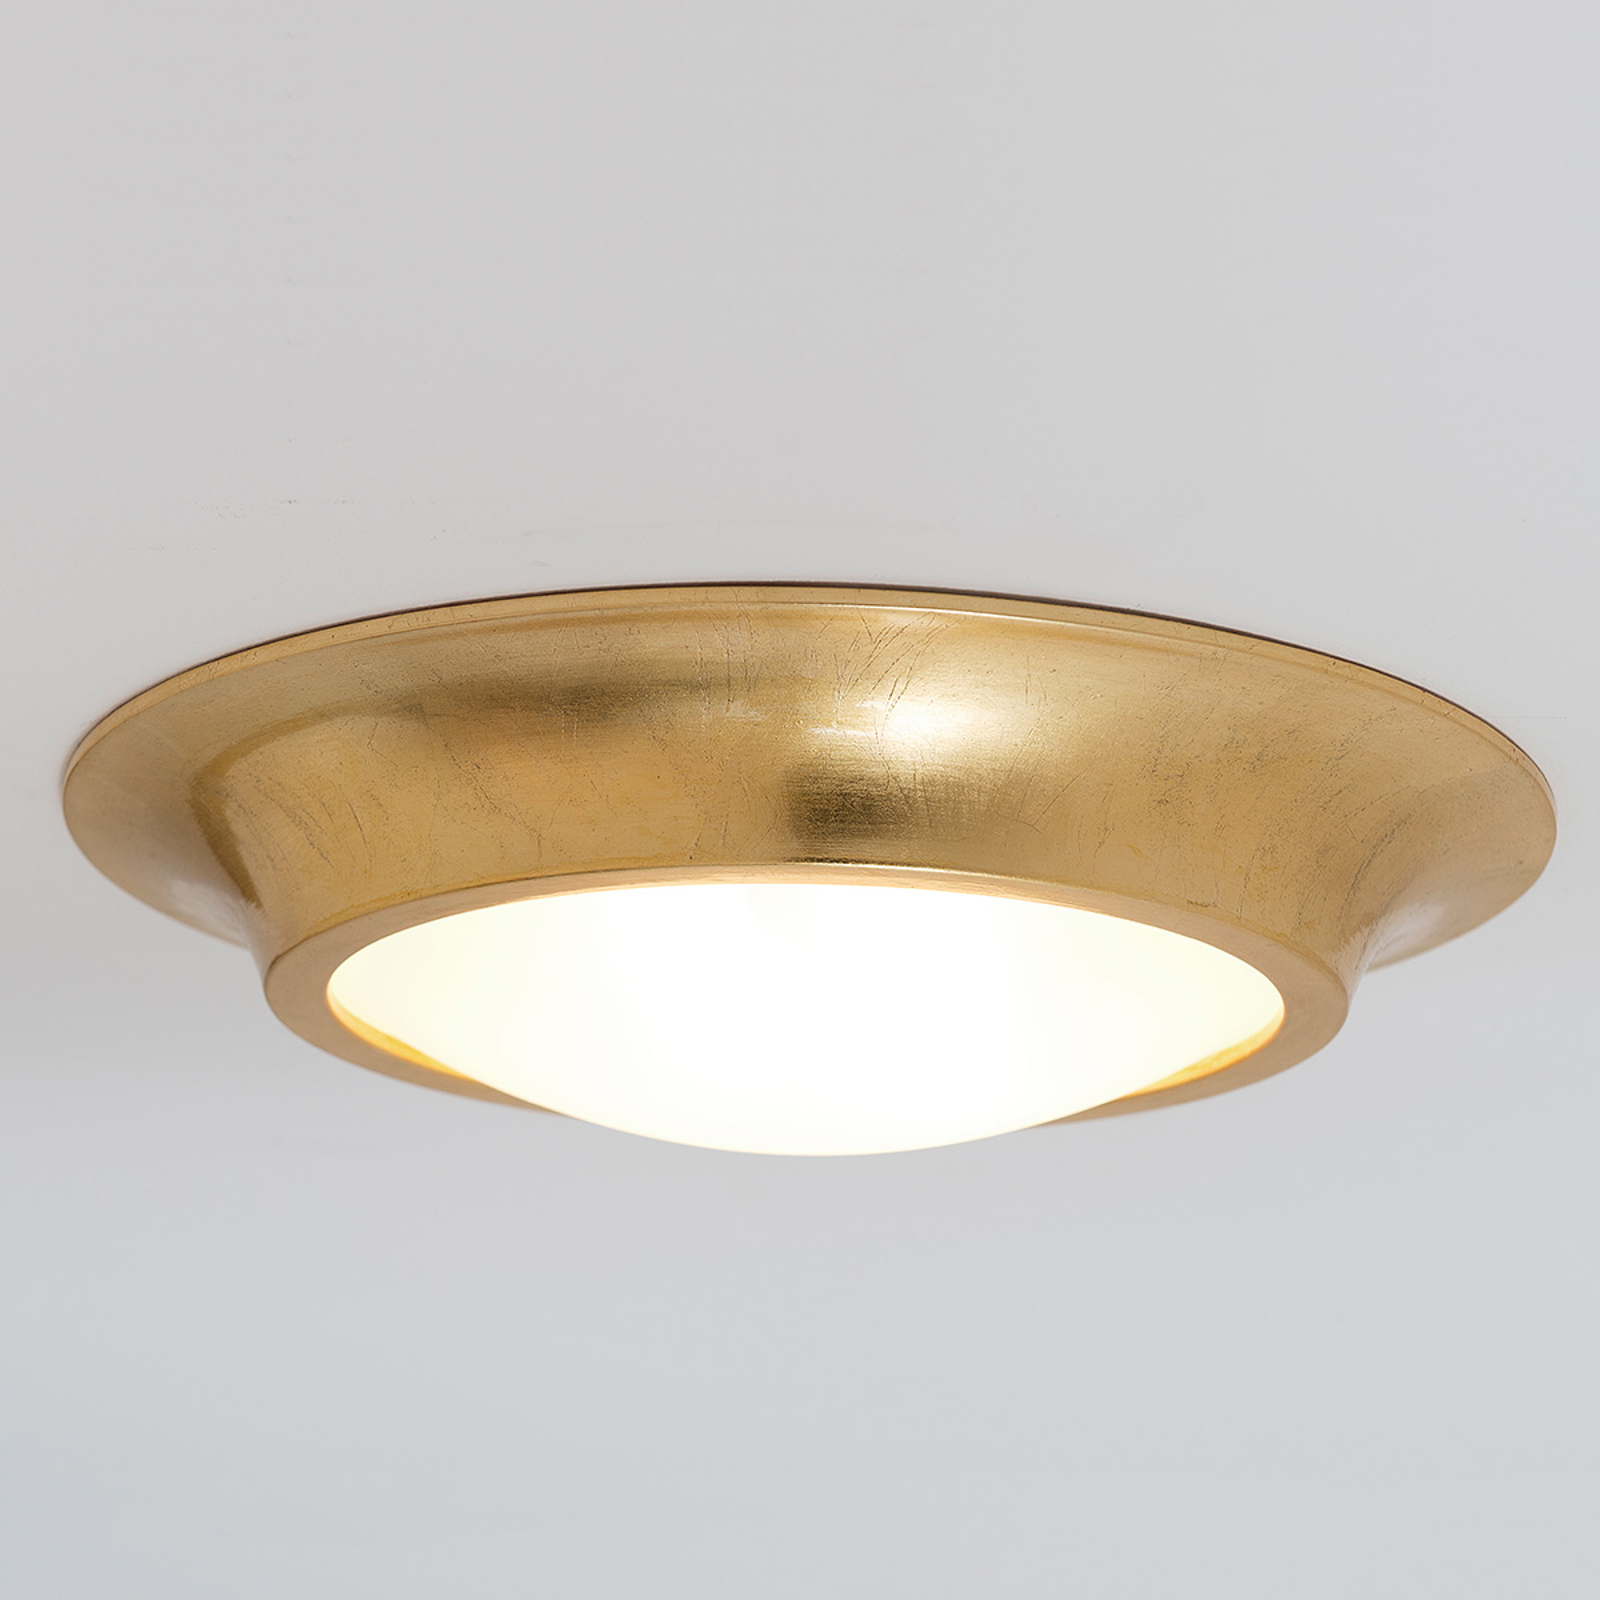 Gouden keramische plafondlamp Spettacolo